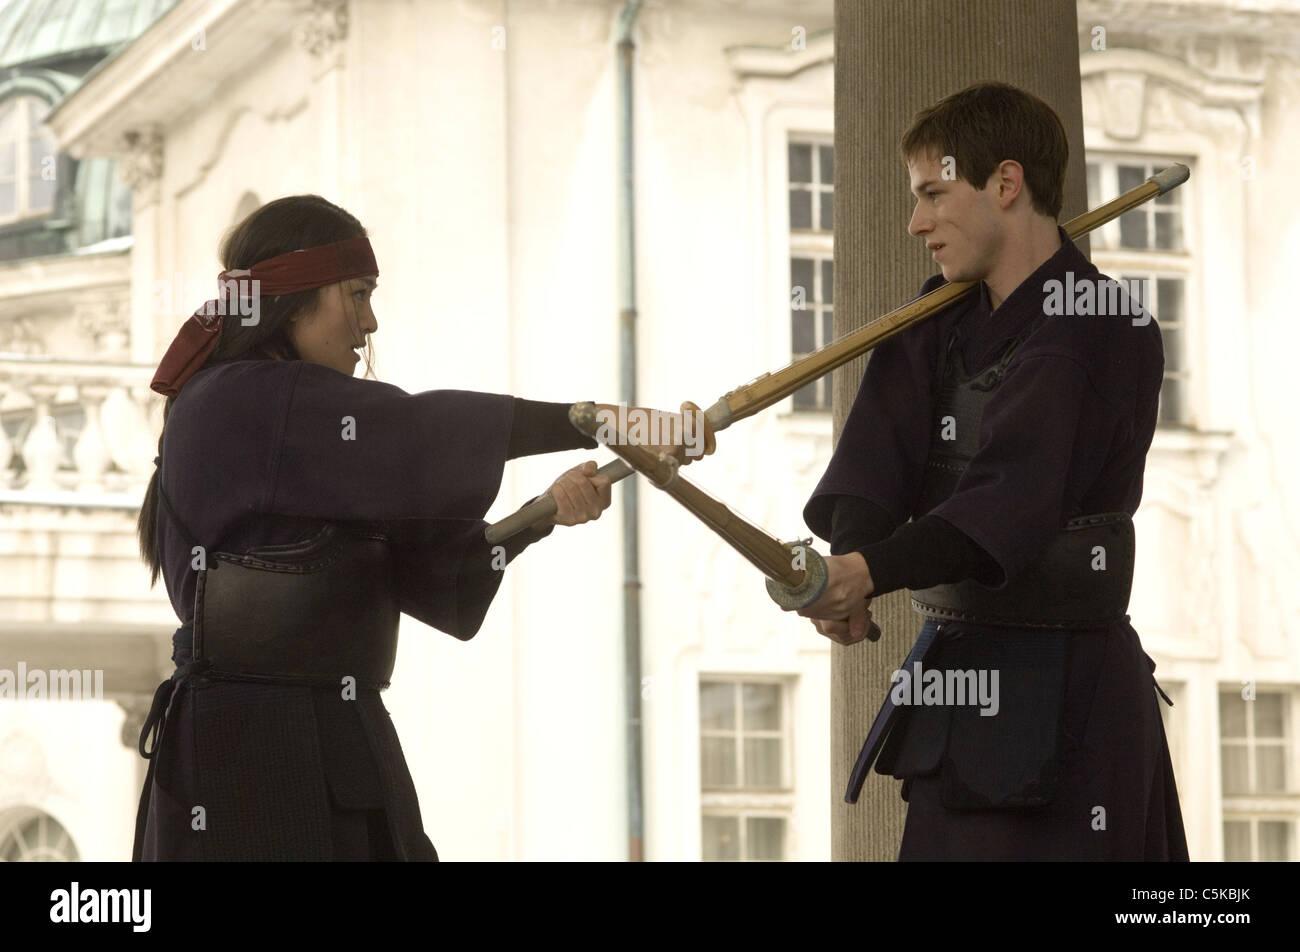 Hannibal Rising  Year: 2007 - France / UK / USA Gaspard Ulliel, Gong Li  Director: Peter Webber - Stock Image